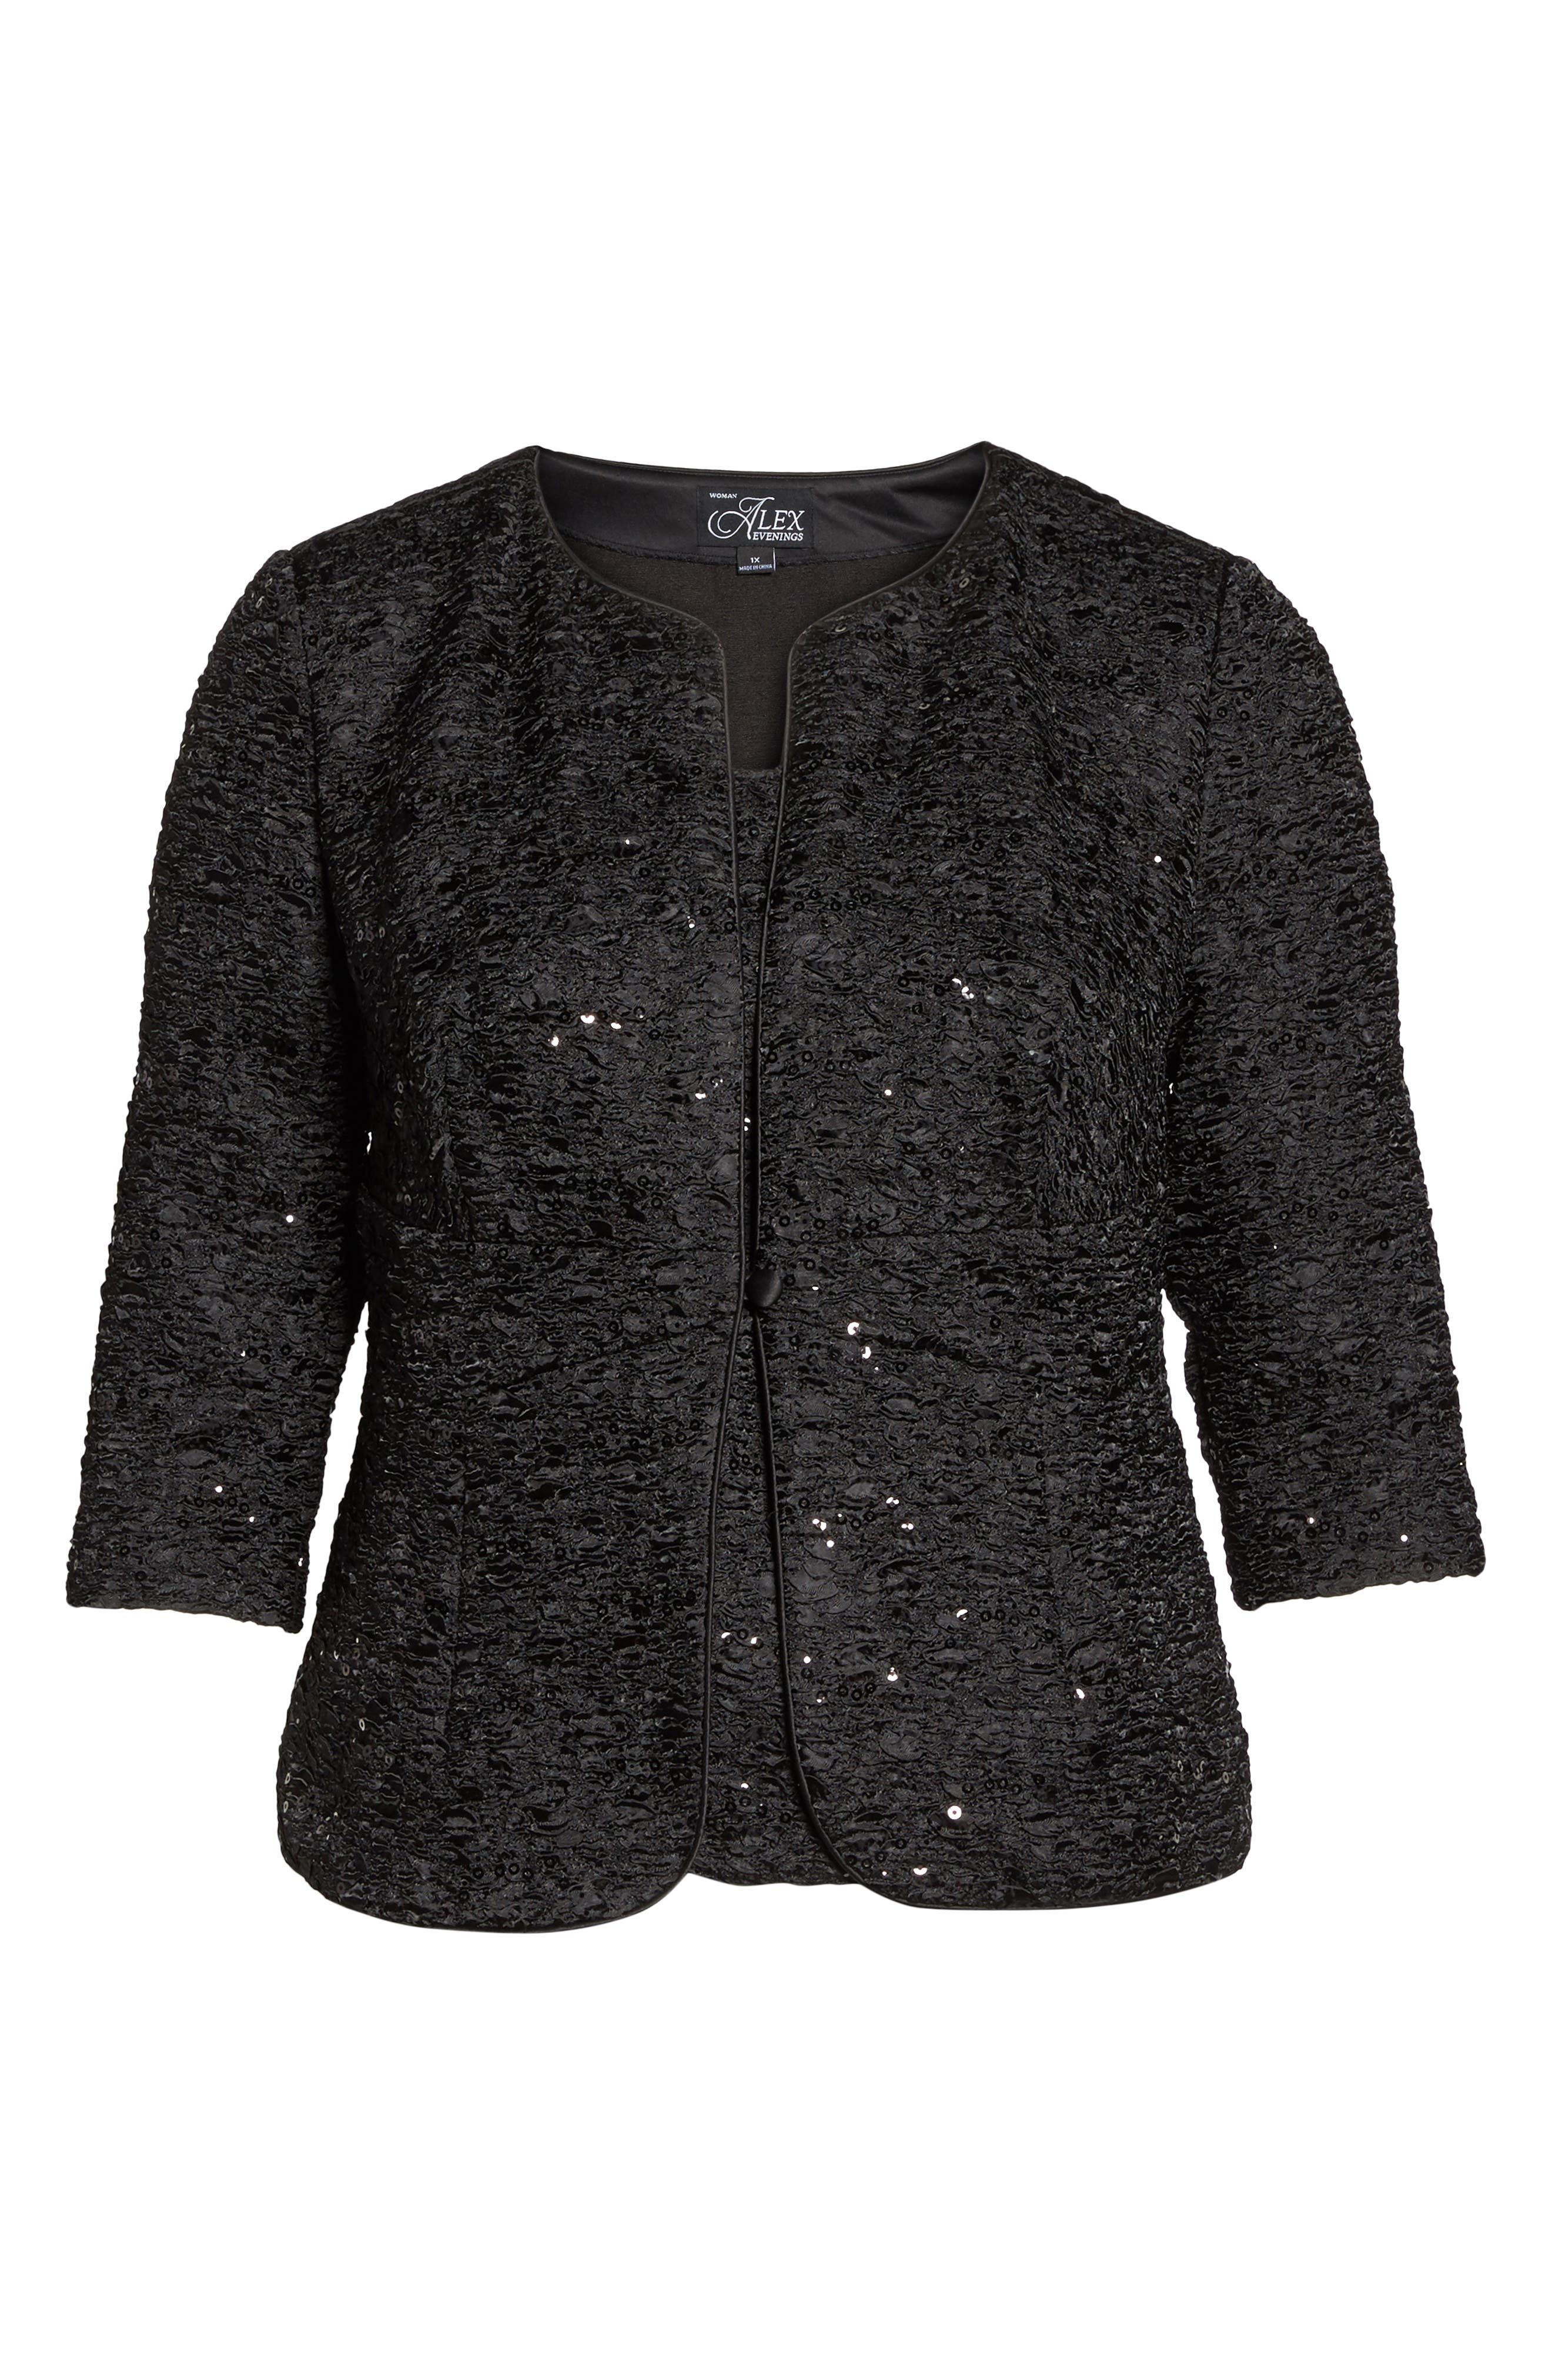 Sequin Jacket & Camisole Twinset,                             Alternate thumbnail 6, color,                             001